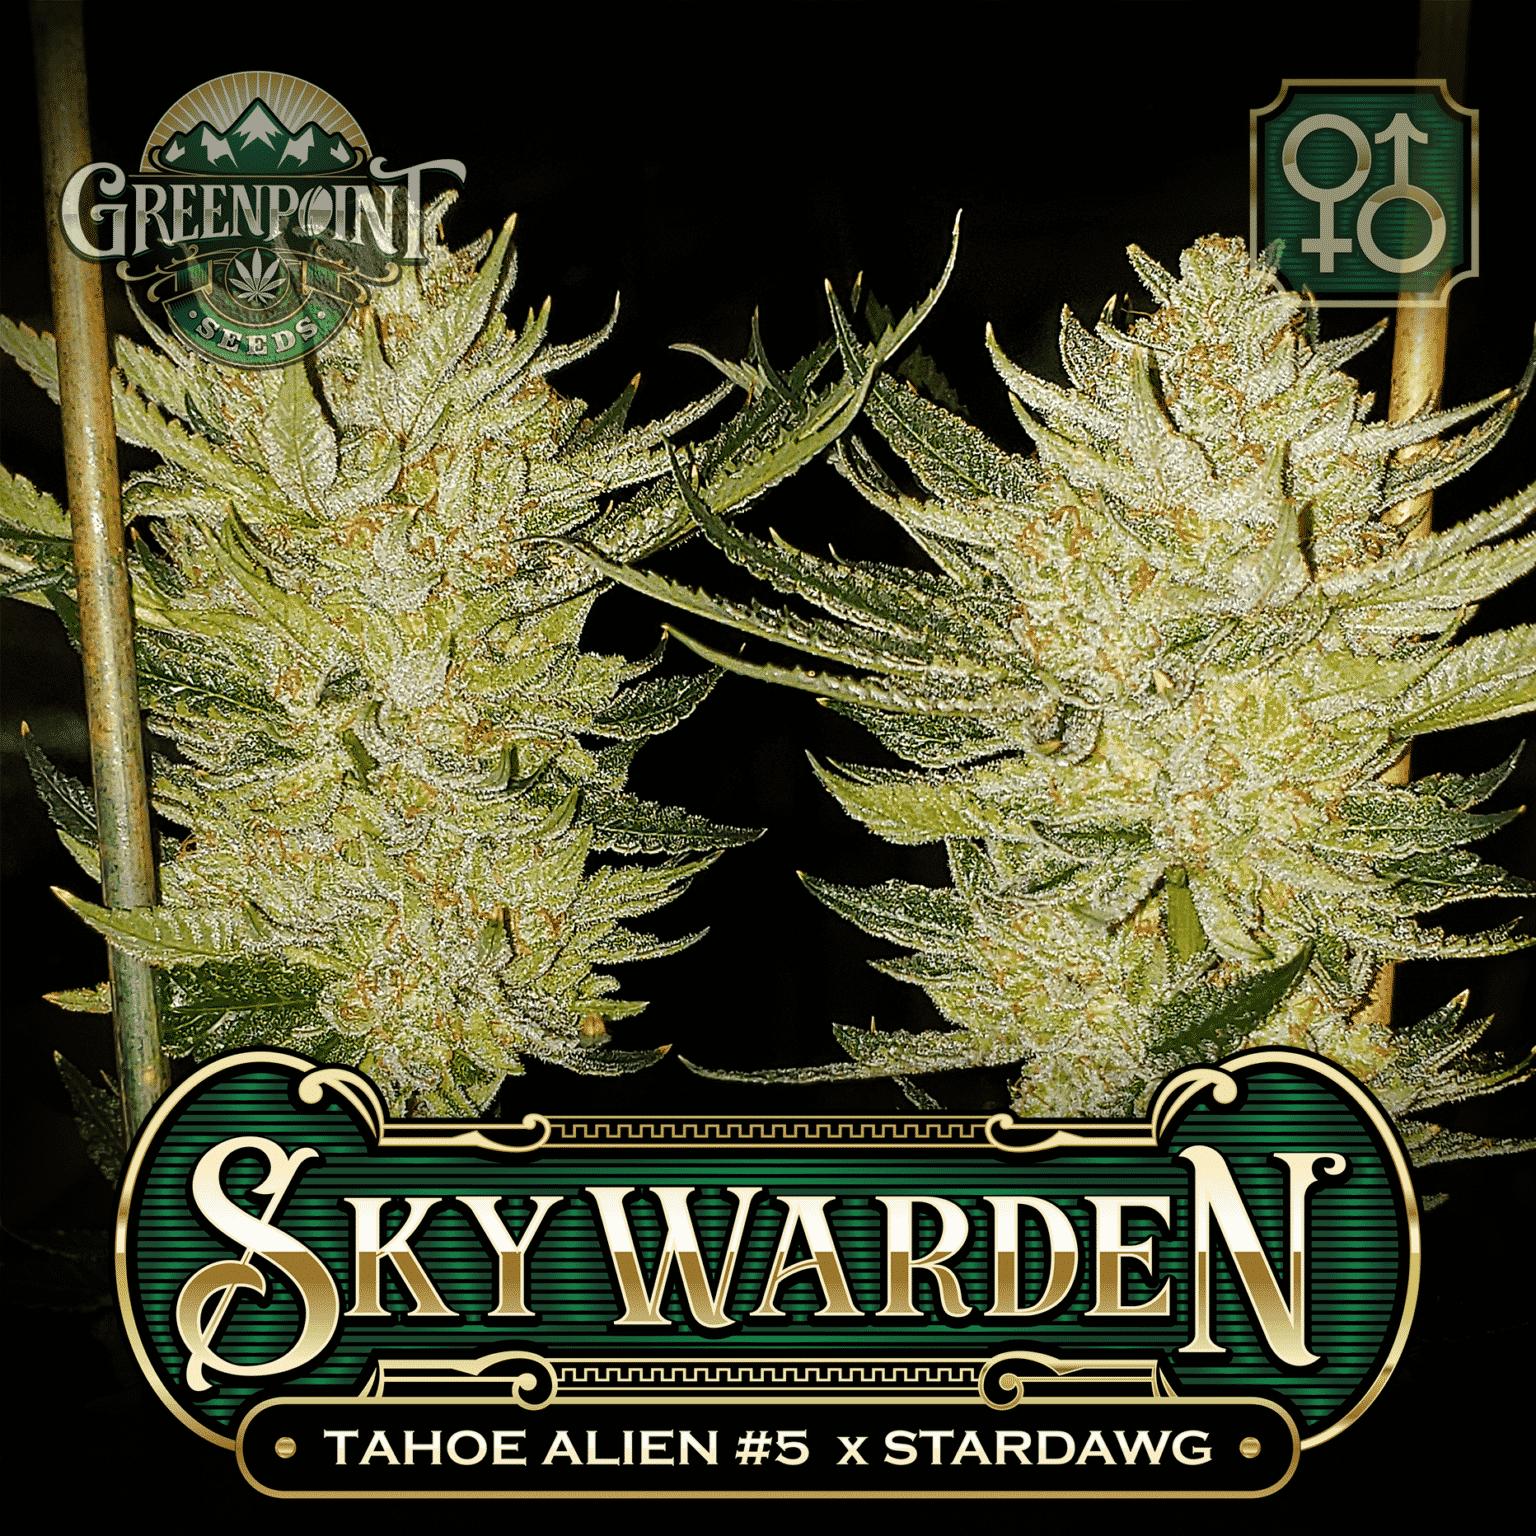 Tahoe Alien #5 x Stardawg Seeds - Sky Warden Cannabis Seeds - Greenpoint Seed Bank Colorado